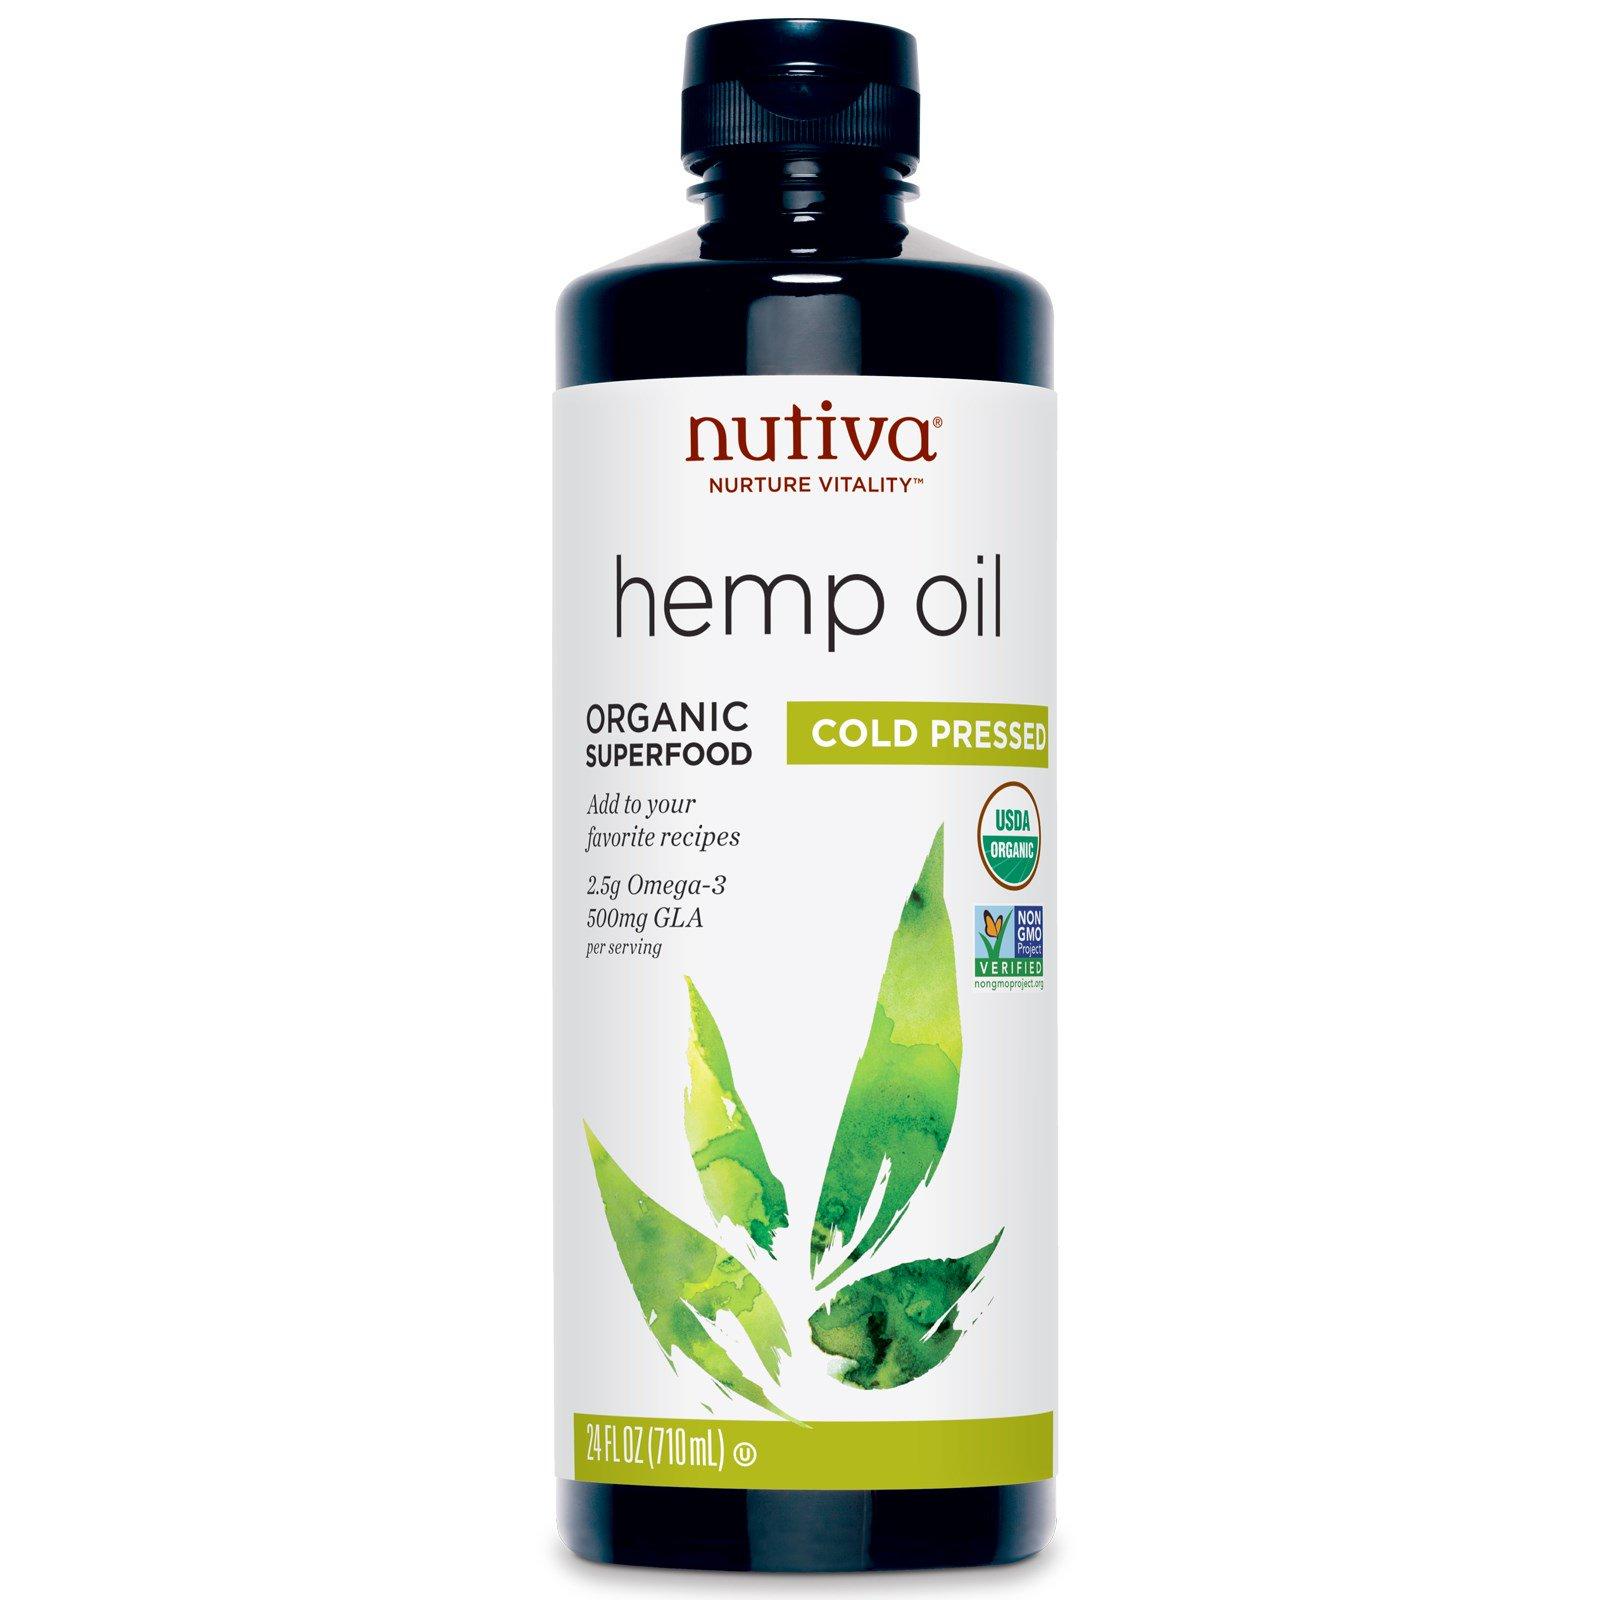 Nutiva, Organic Hemp Oil, Cold Pressed, 24 Fl Oz (710 Ml